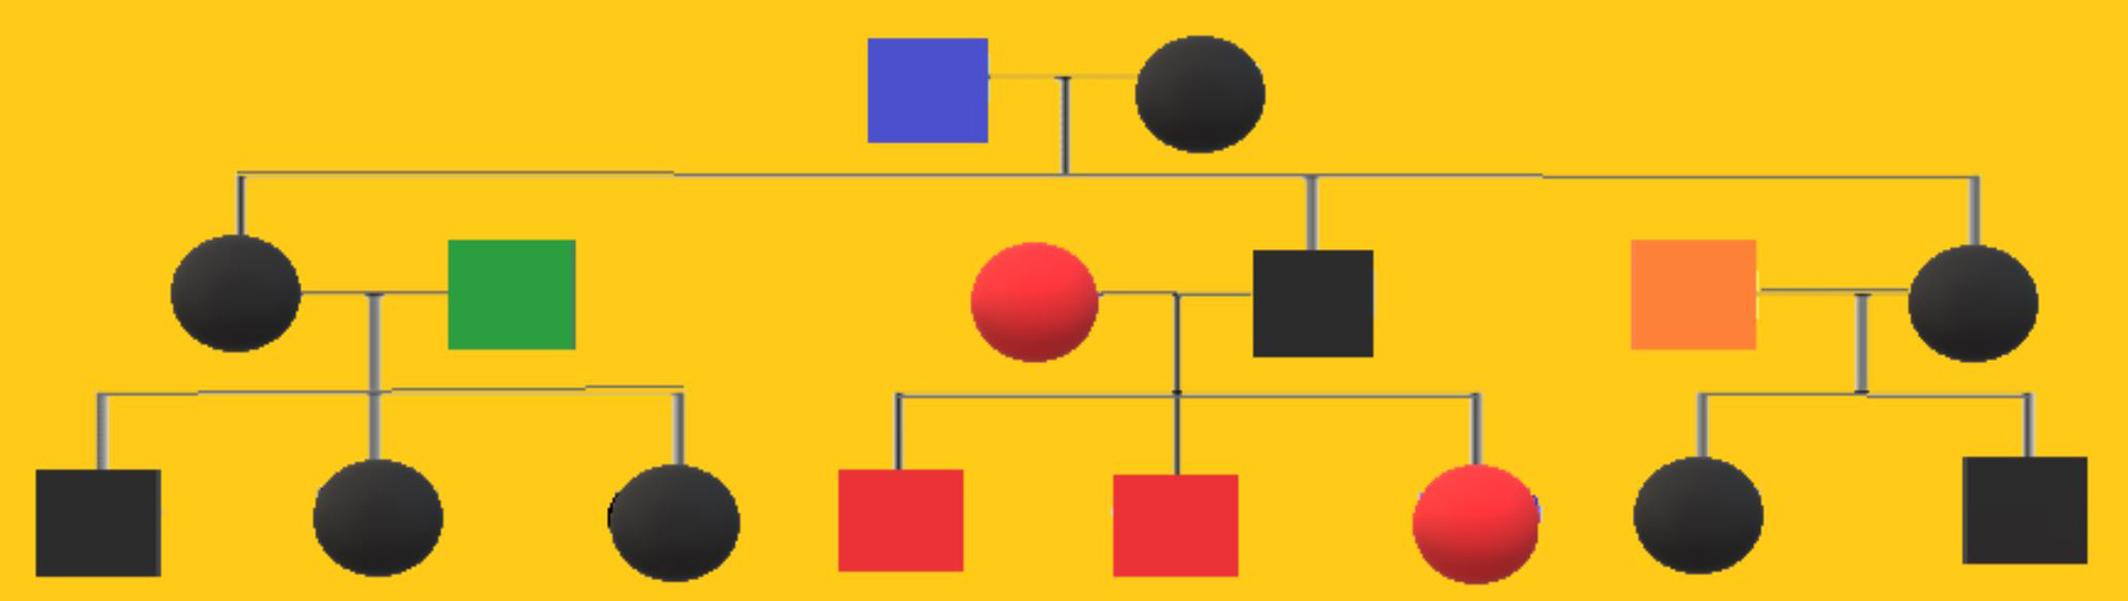 Human Genetics - Tree